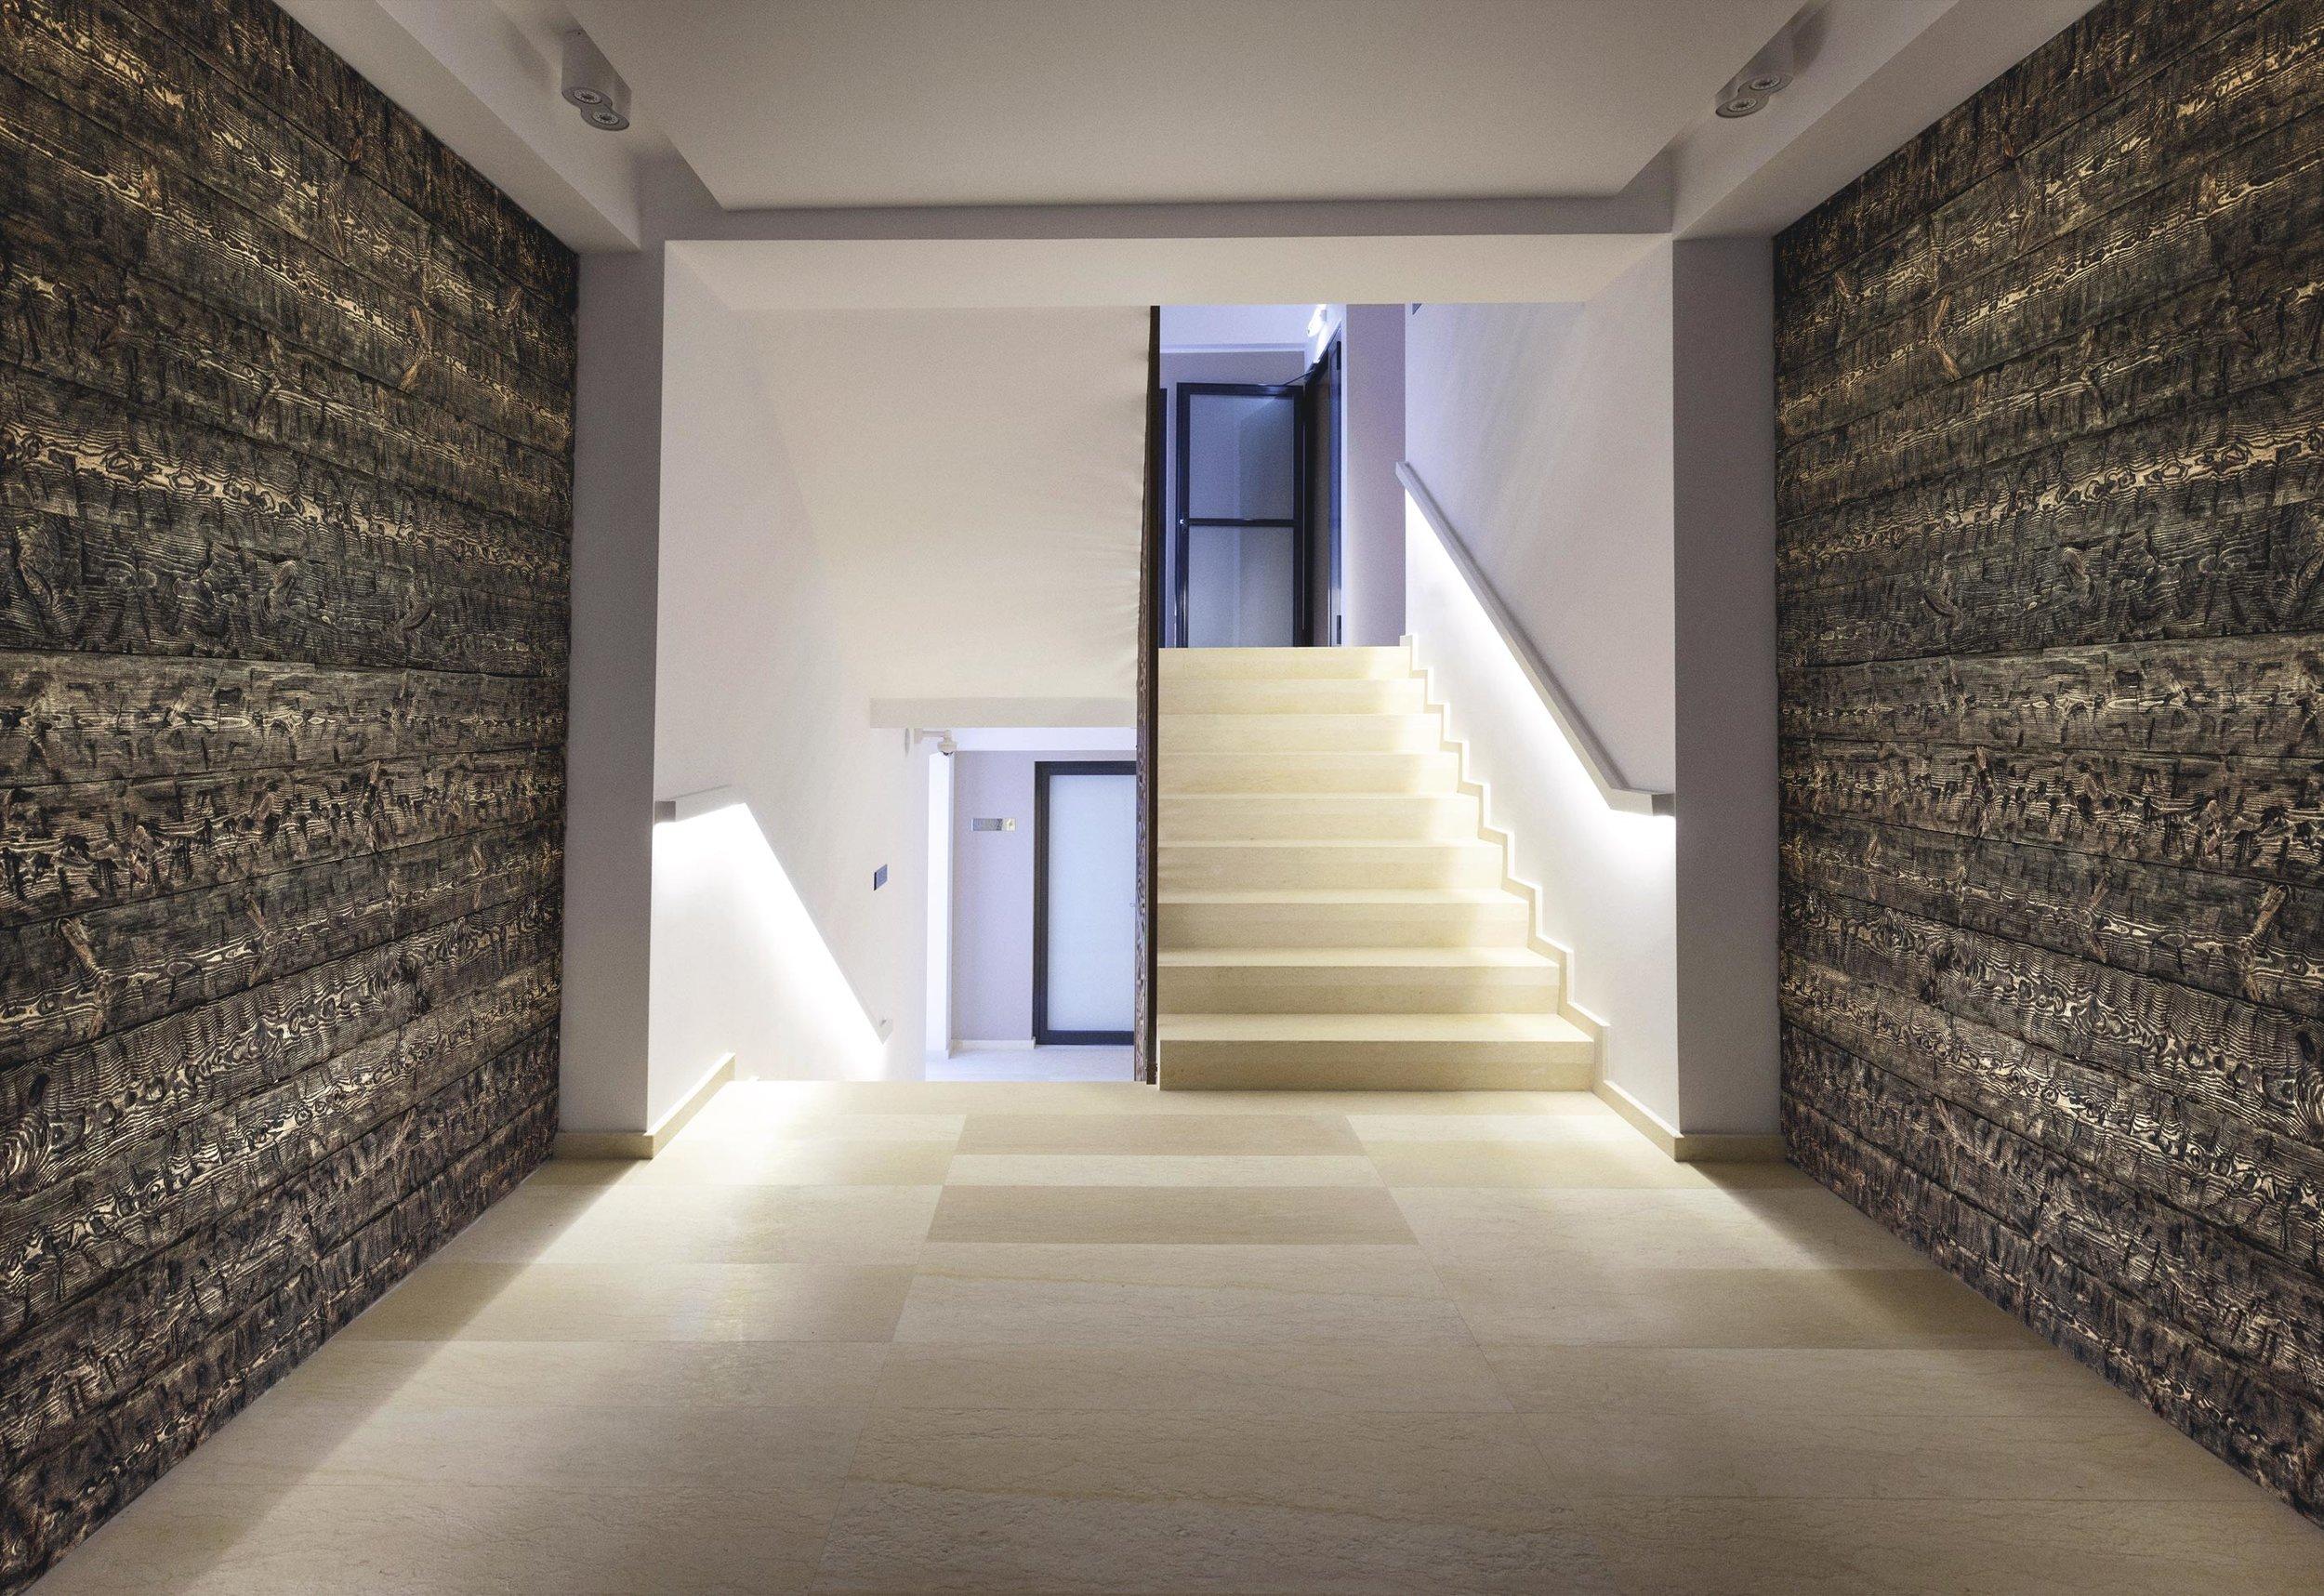 rwood_corridor-staircase-wooden-walls.jpg